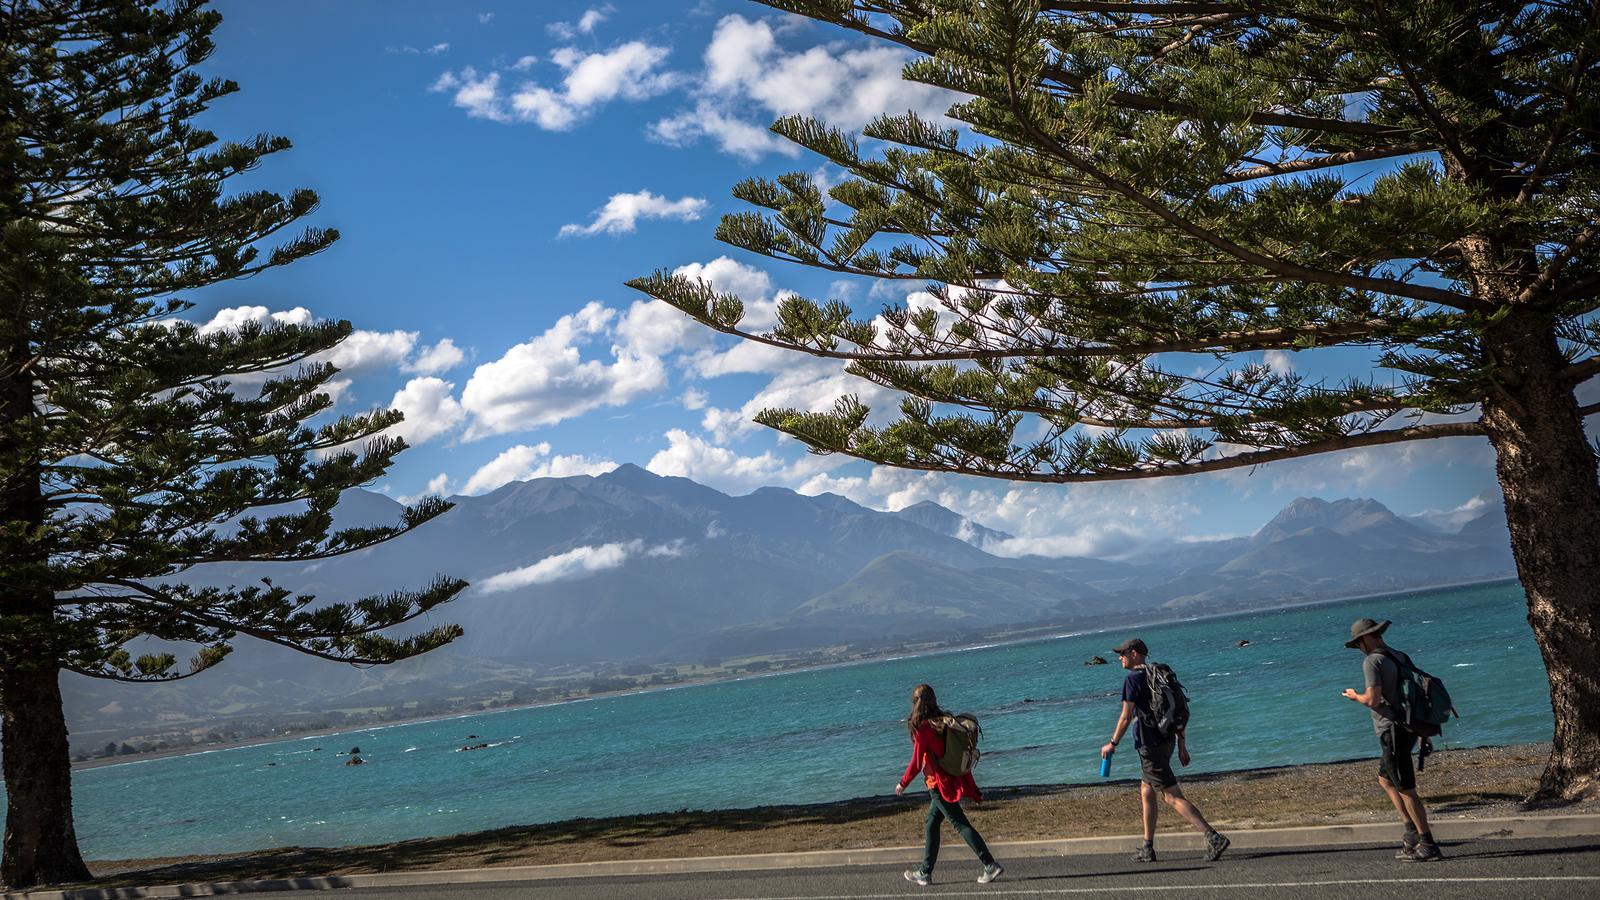 New Zealand: South Island Encompassed